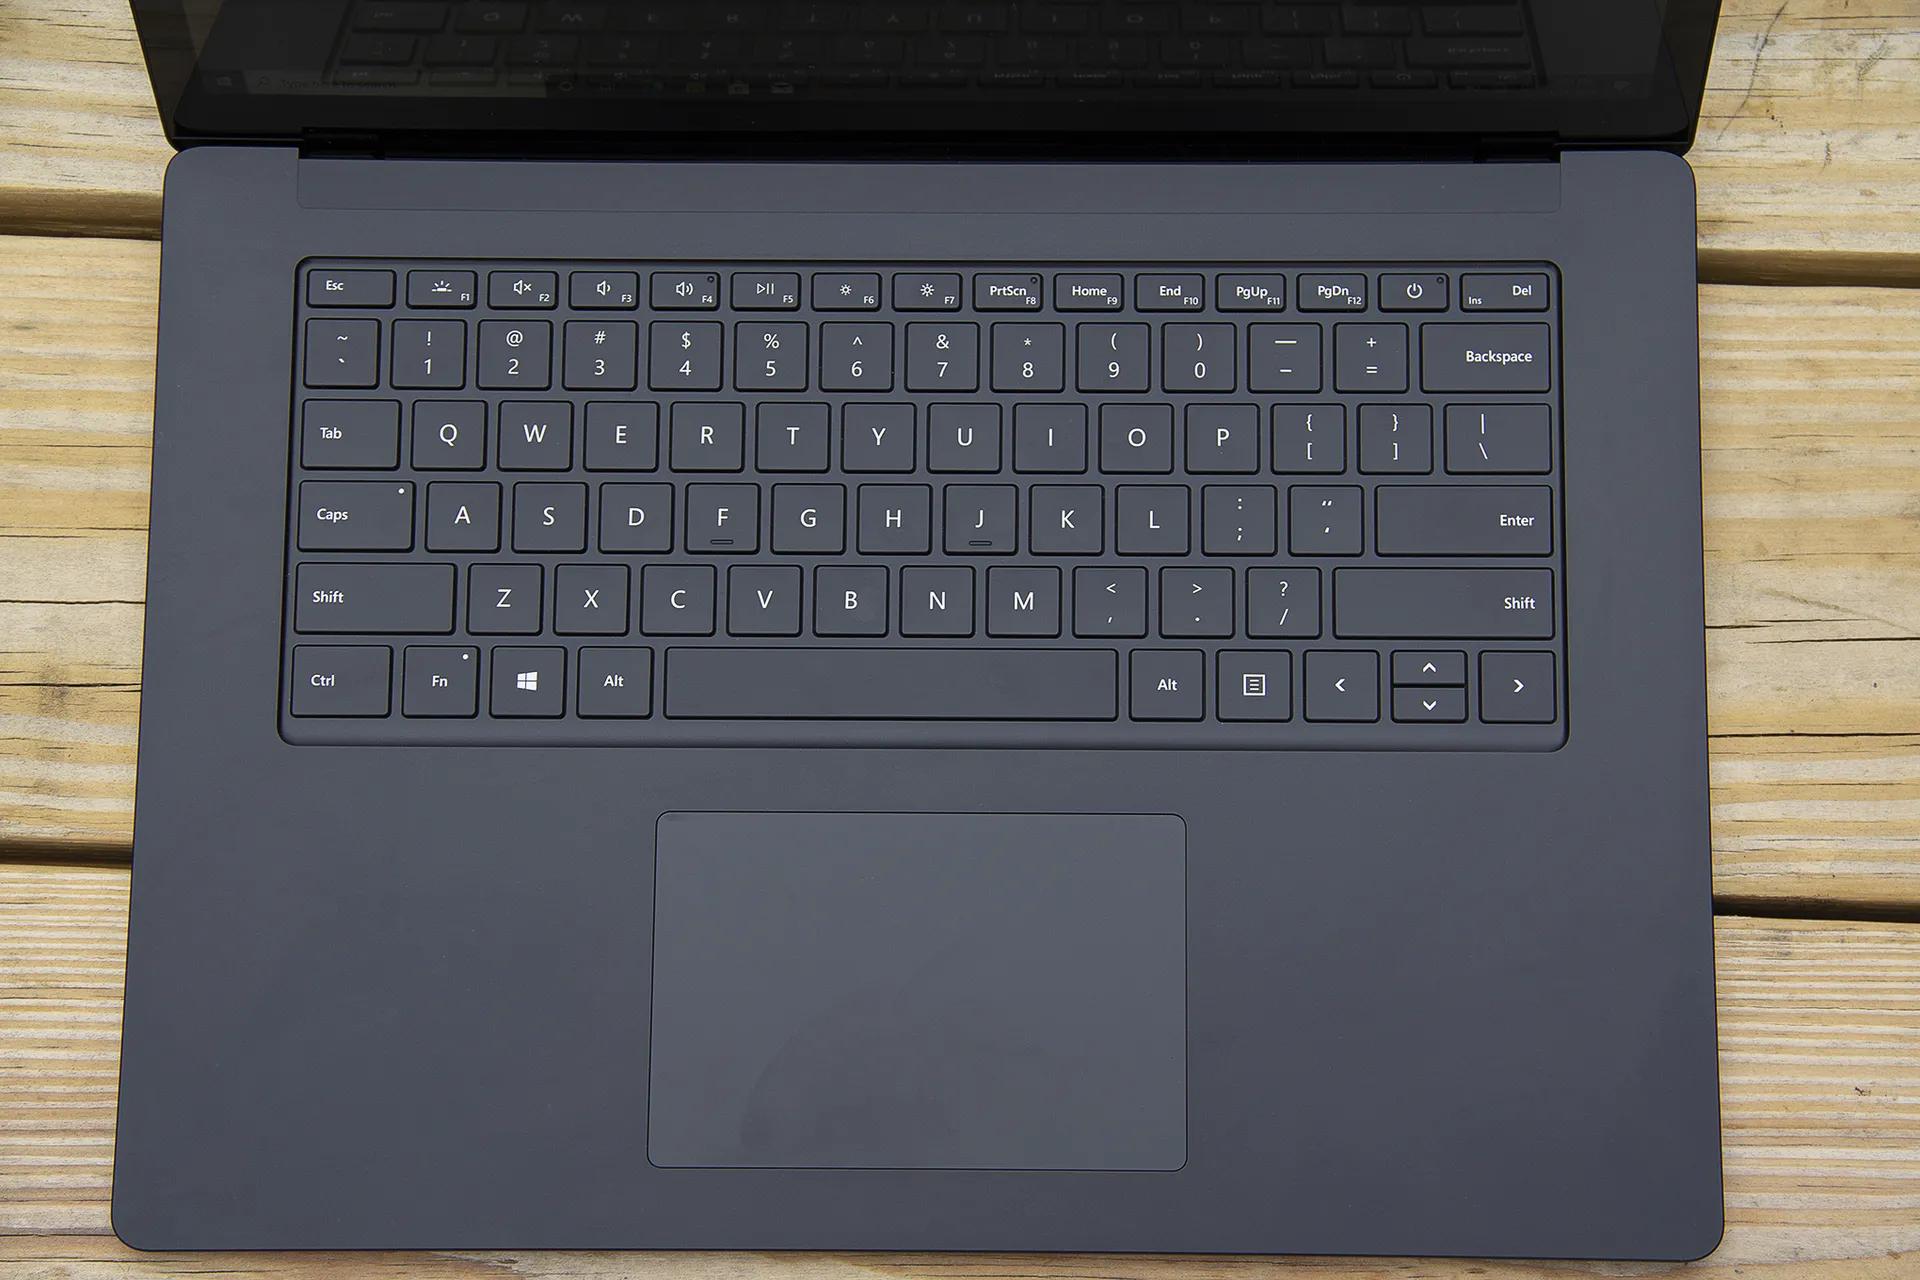 surface_laptop_4_15_inch_keyboard